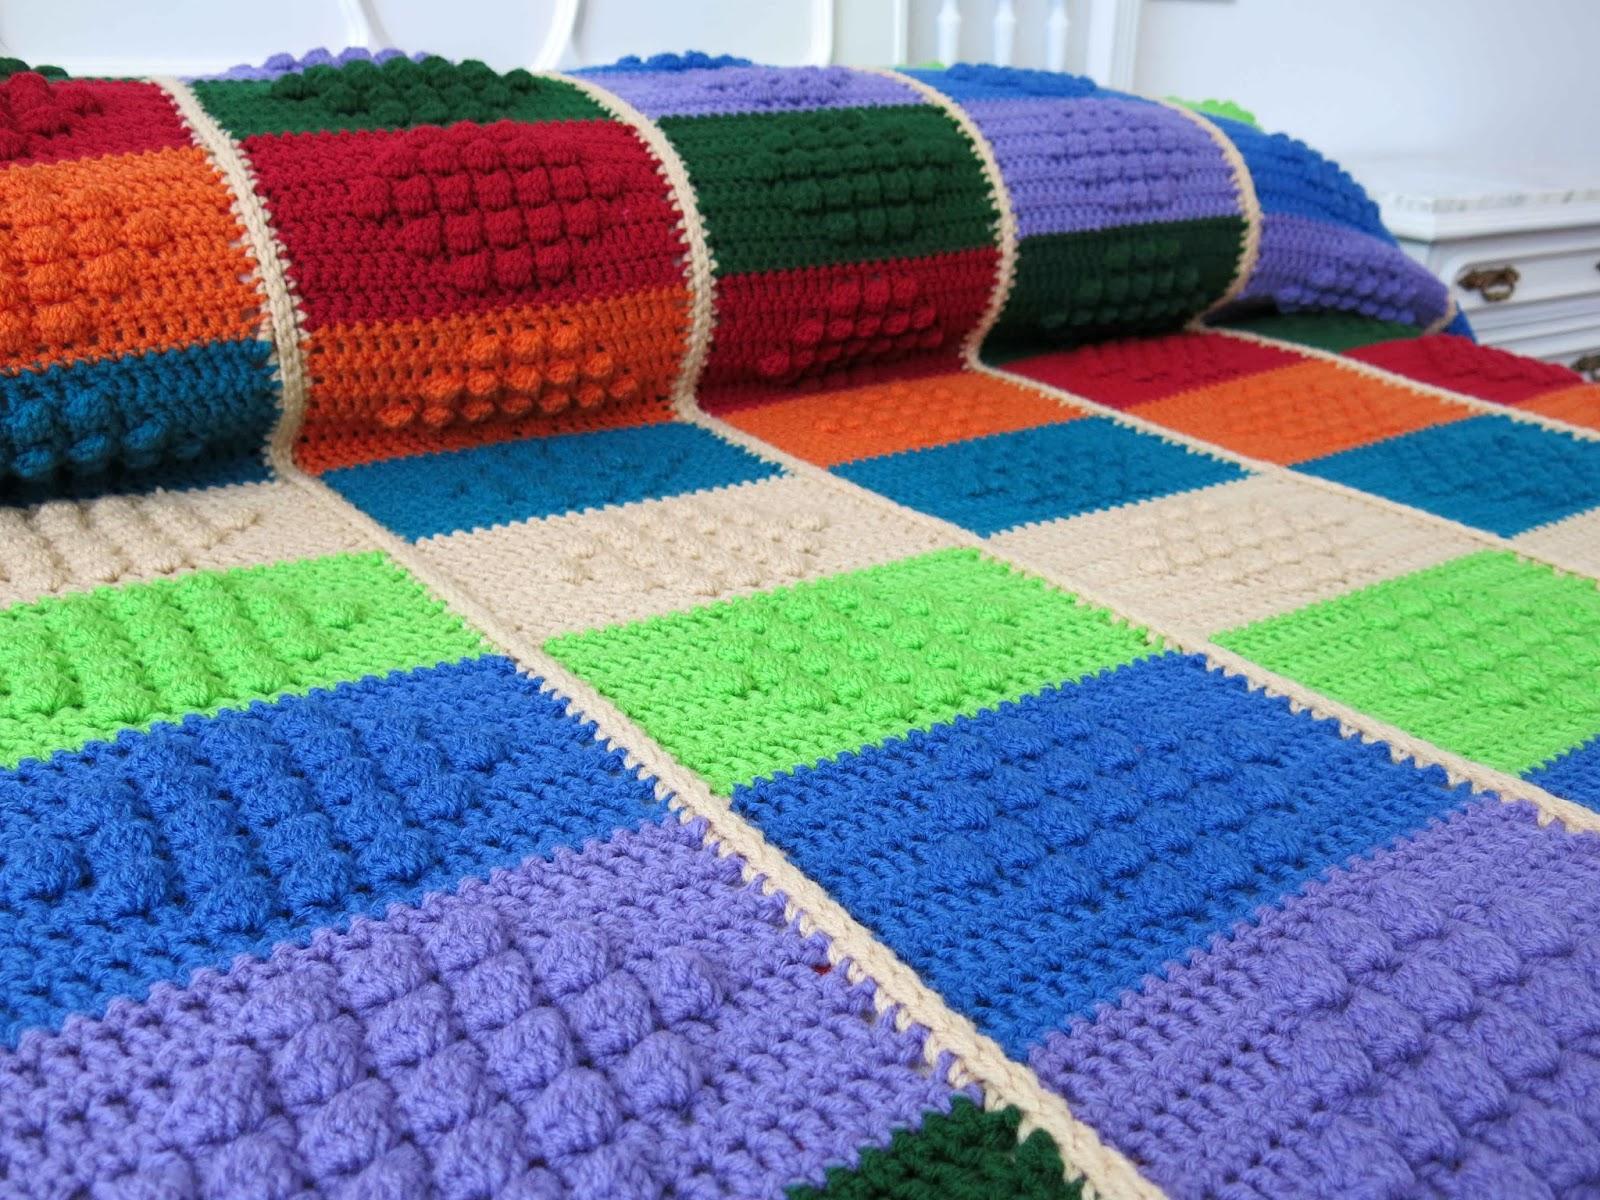 Manta de crochet espacio crochet - Manta de crochet facil ...